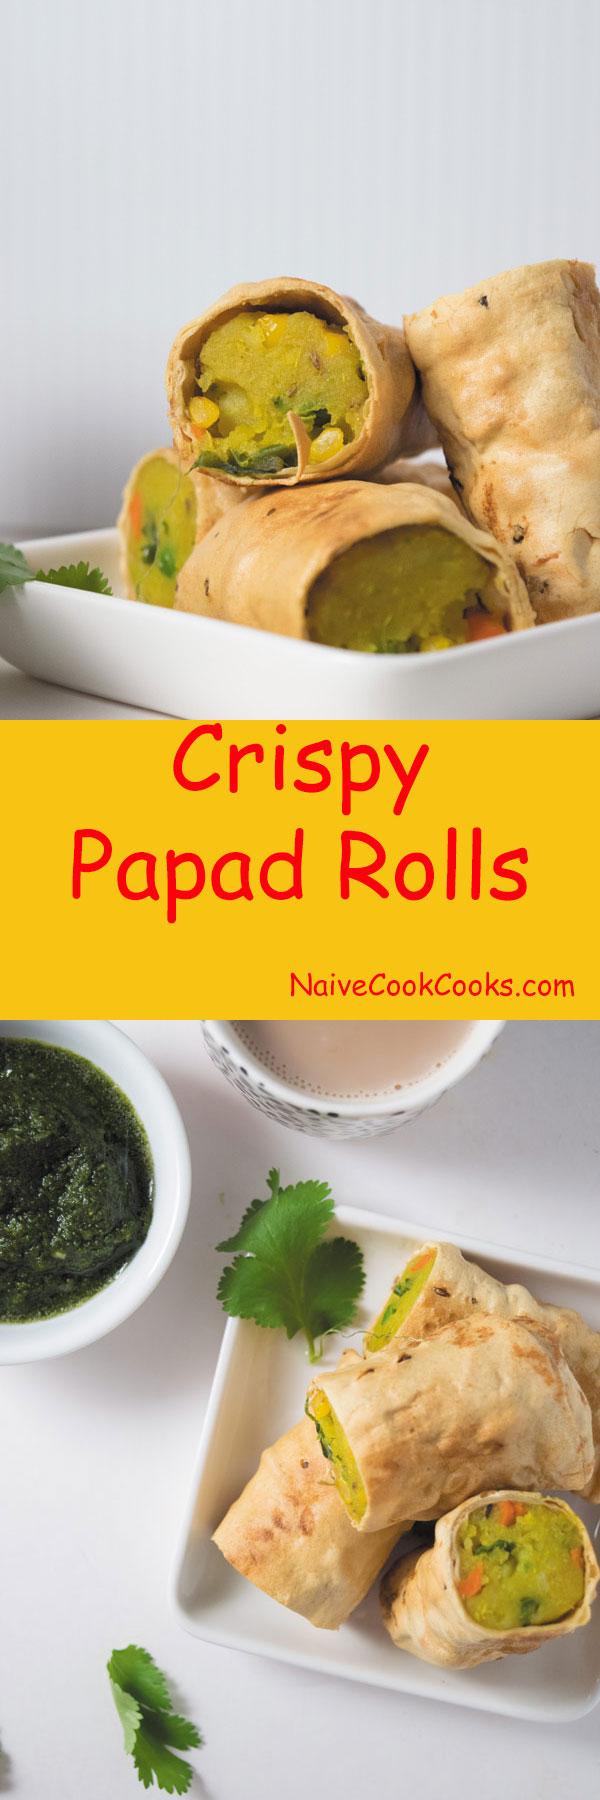 Crispy papad rolls 1